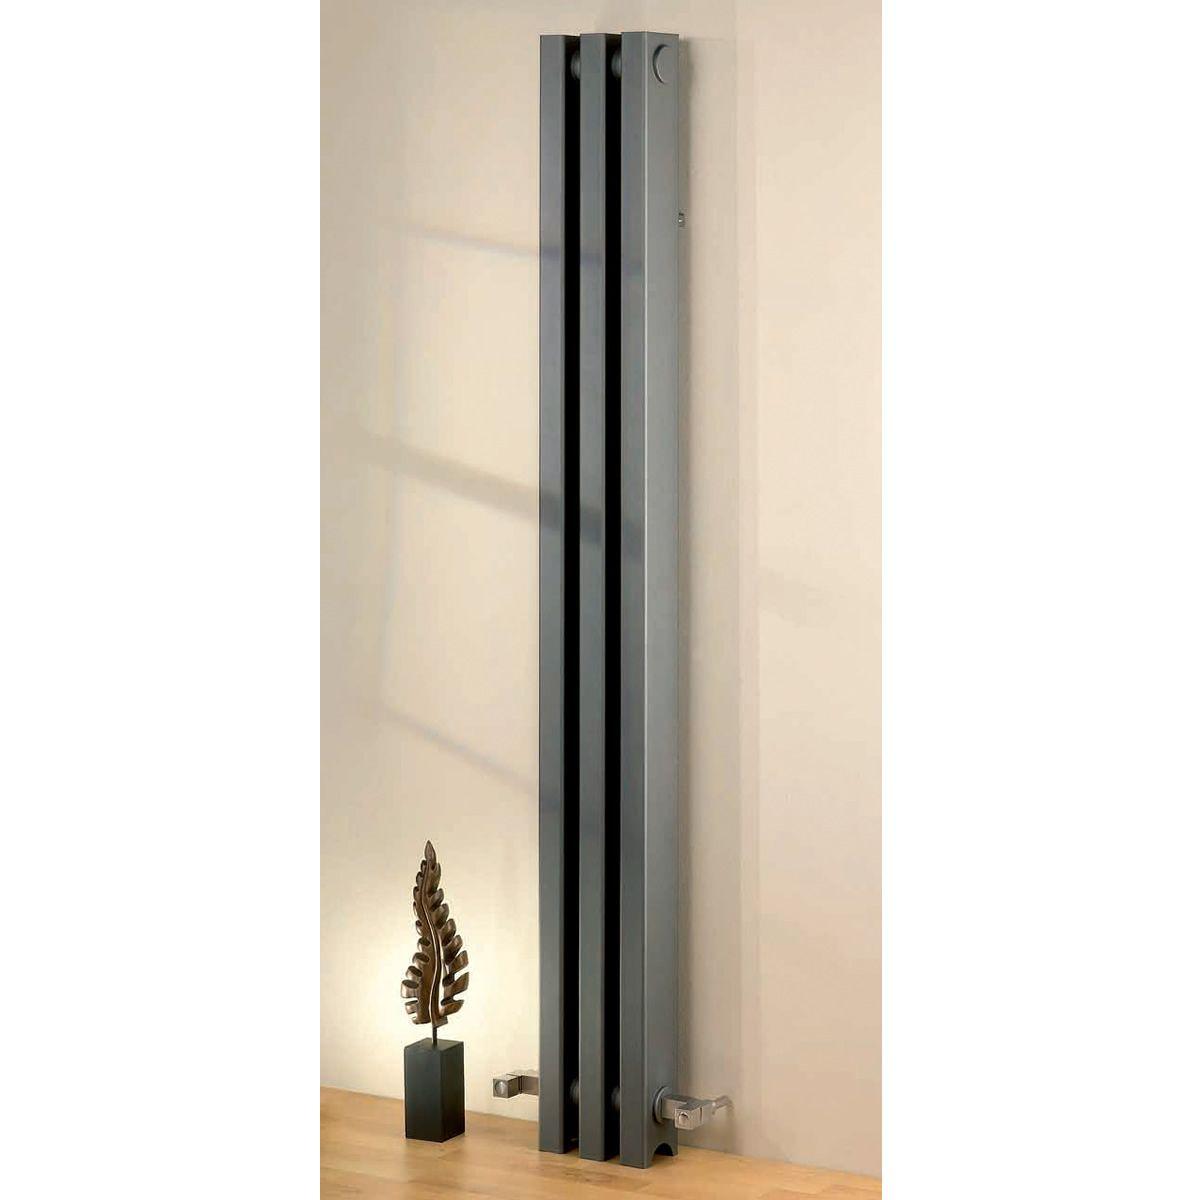 Aestus Quba Vertical Radiator Uk Bathrooms